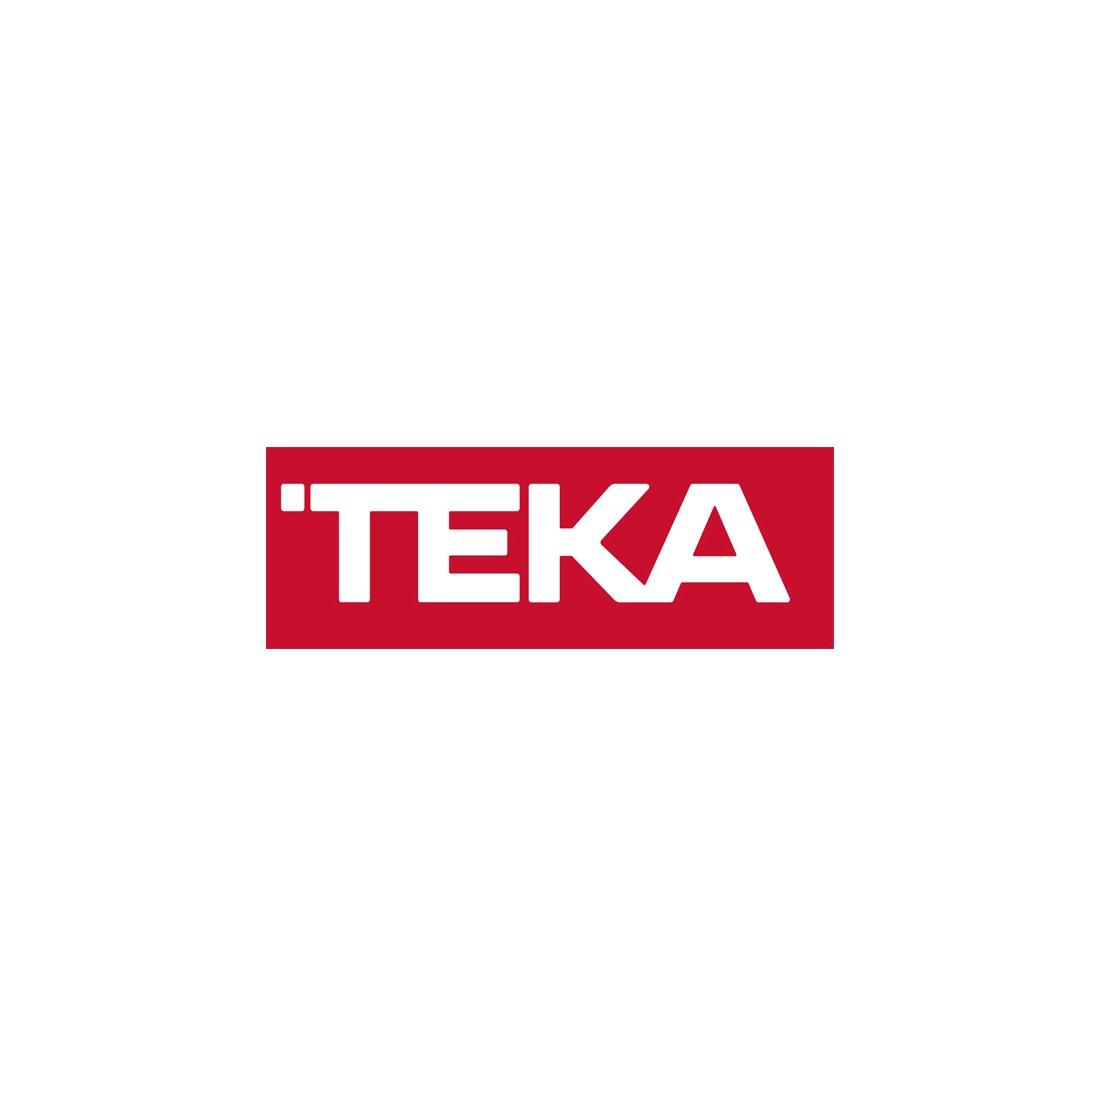 Kit Recirculación - Teka SET RFH 15200 L2C Con tubo